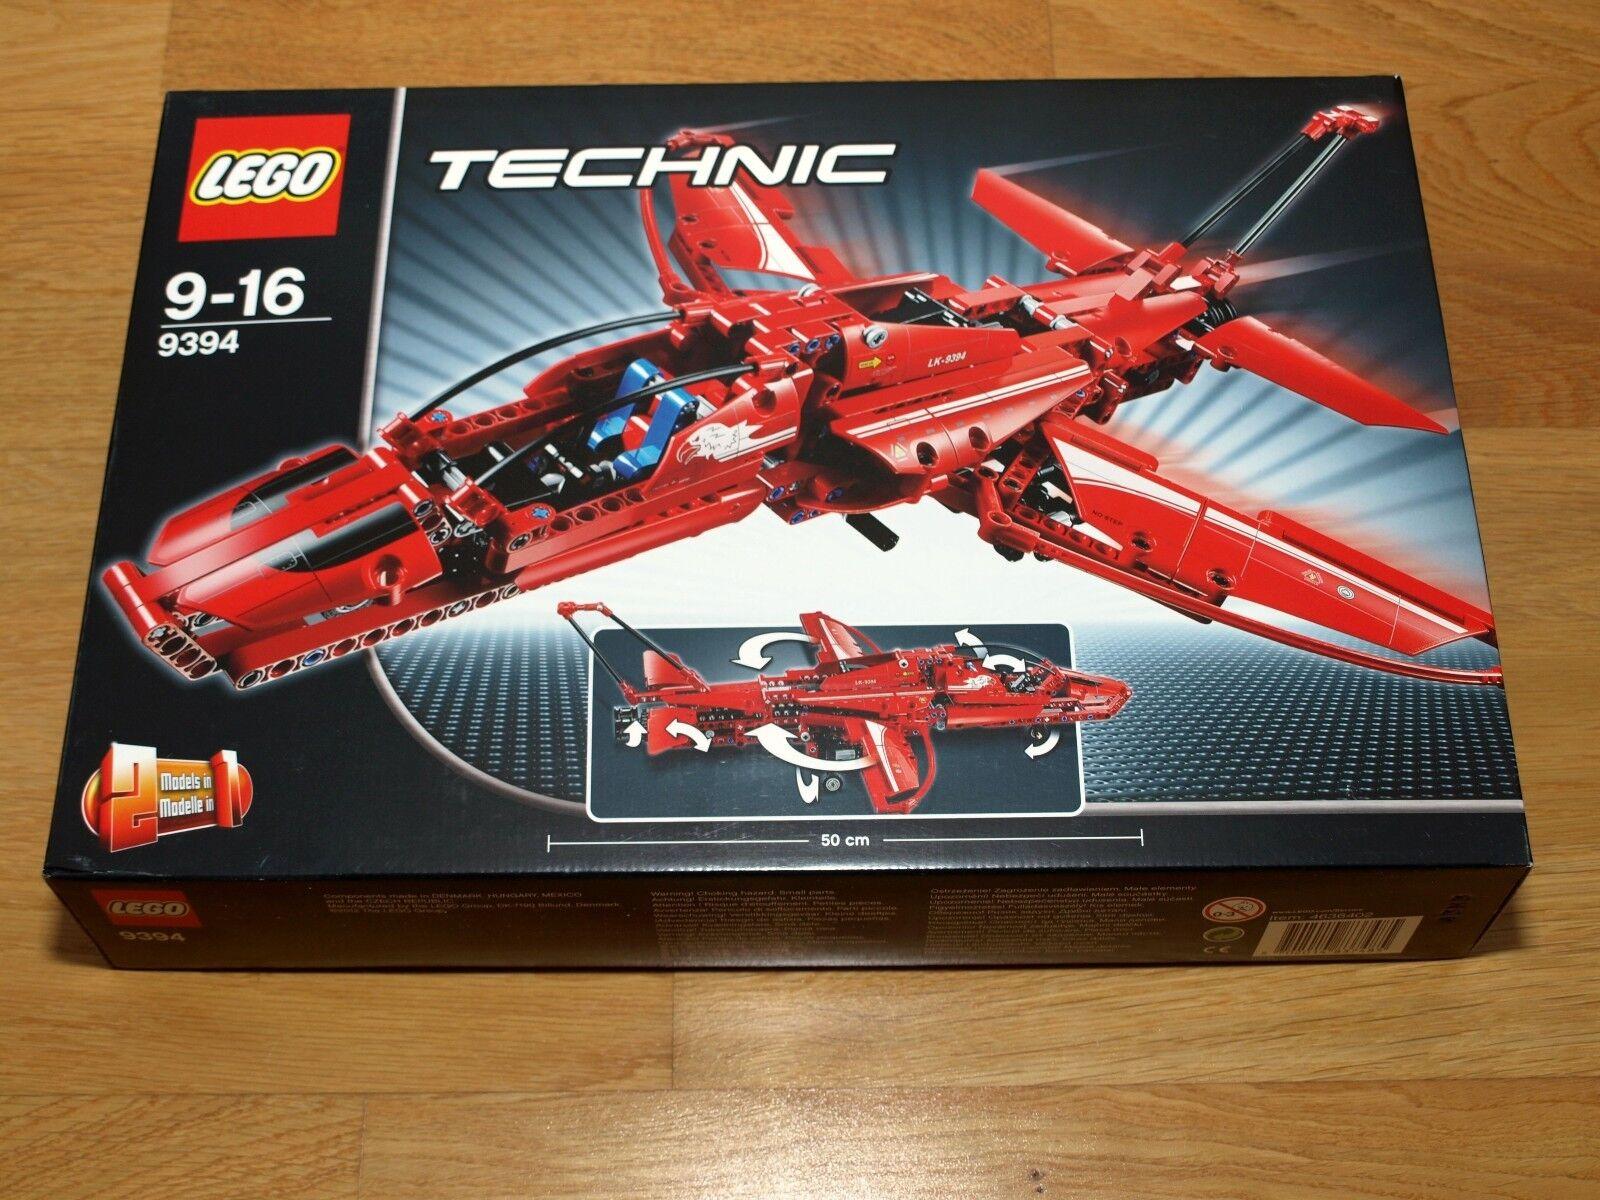 Lego Technic Jet Plane Set 9394 - BNISB